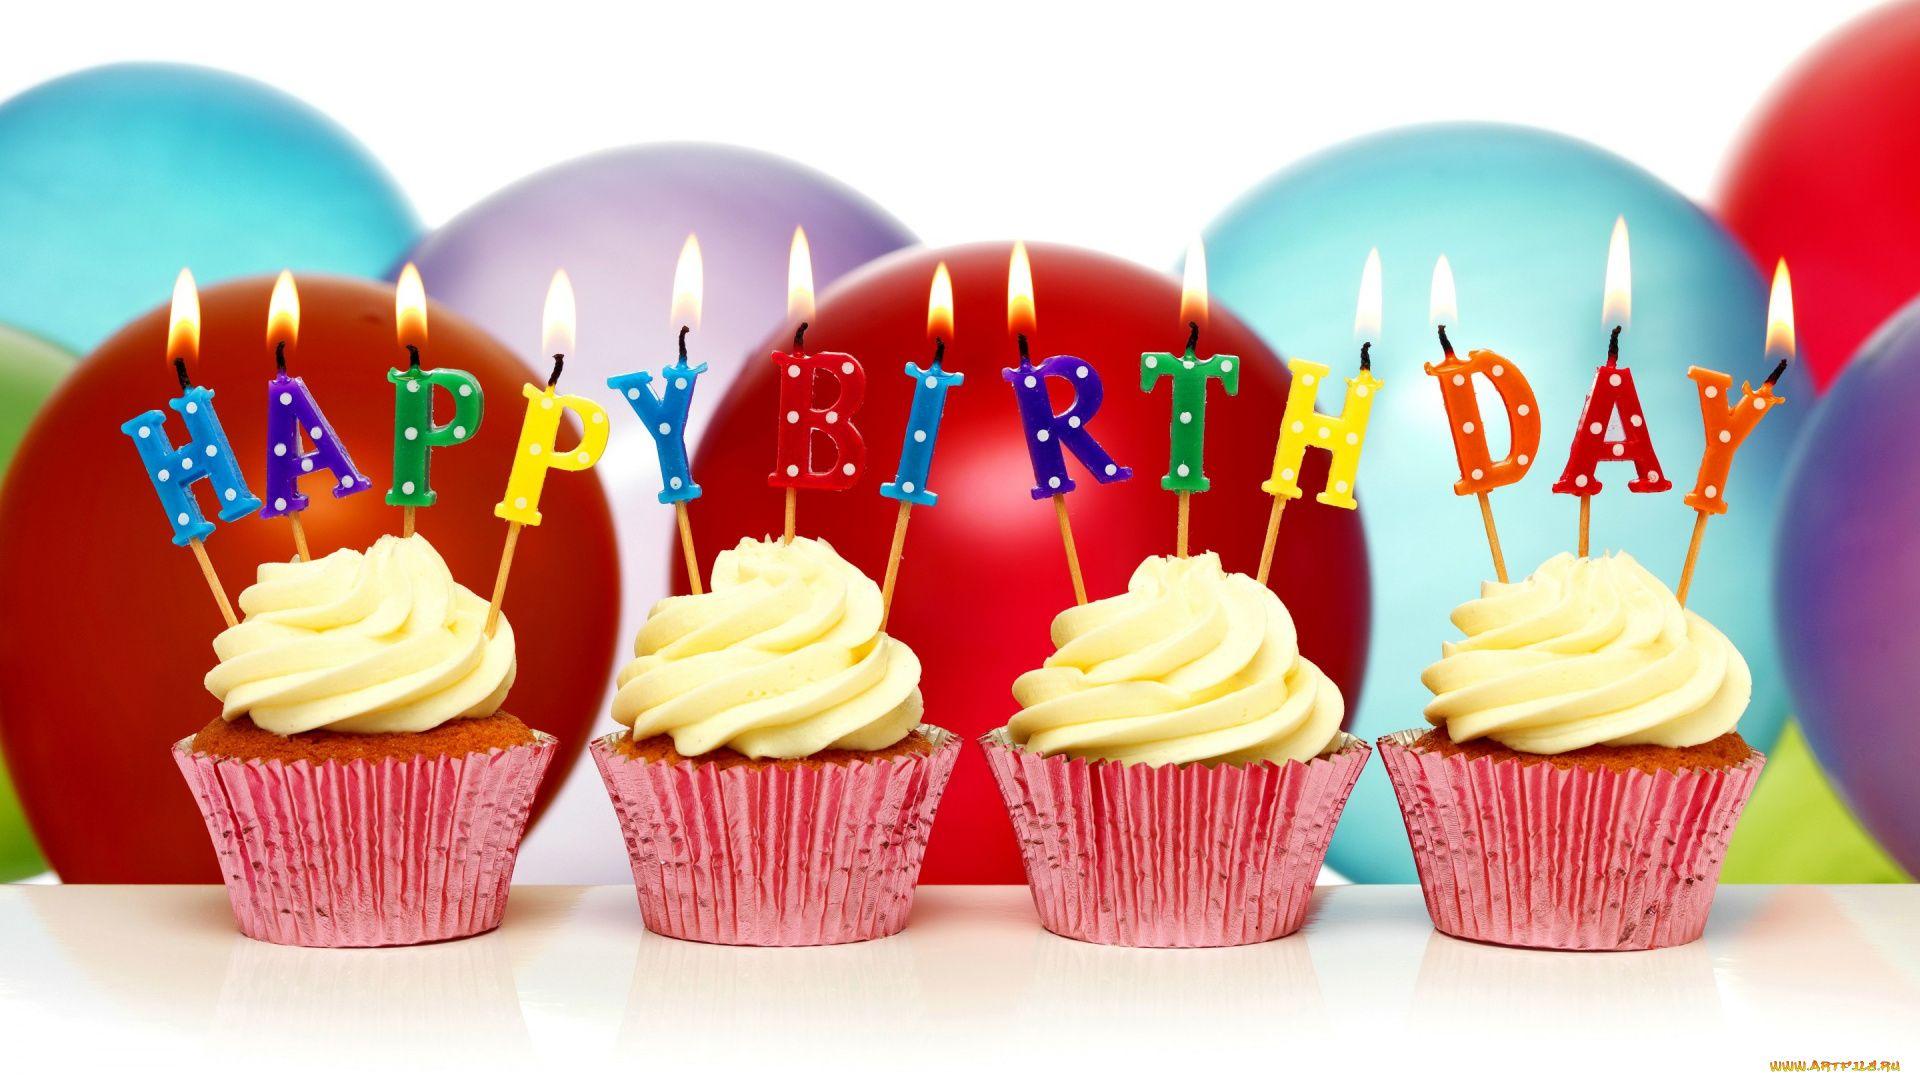 Birthday Cake wallpaper image